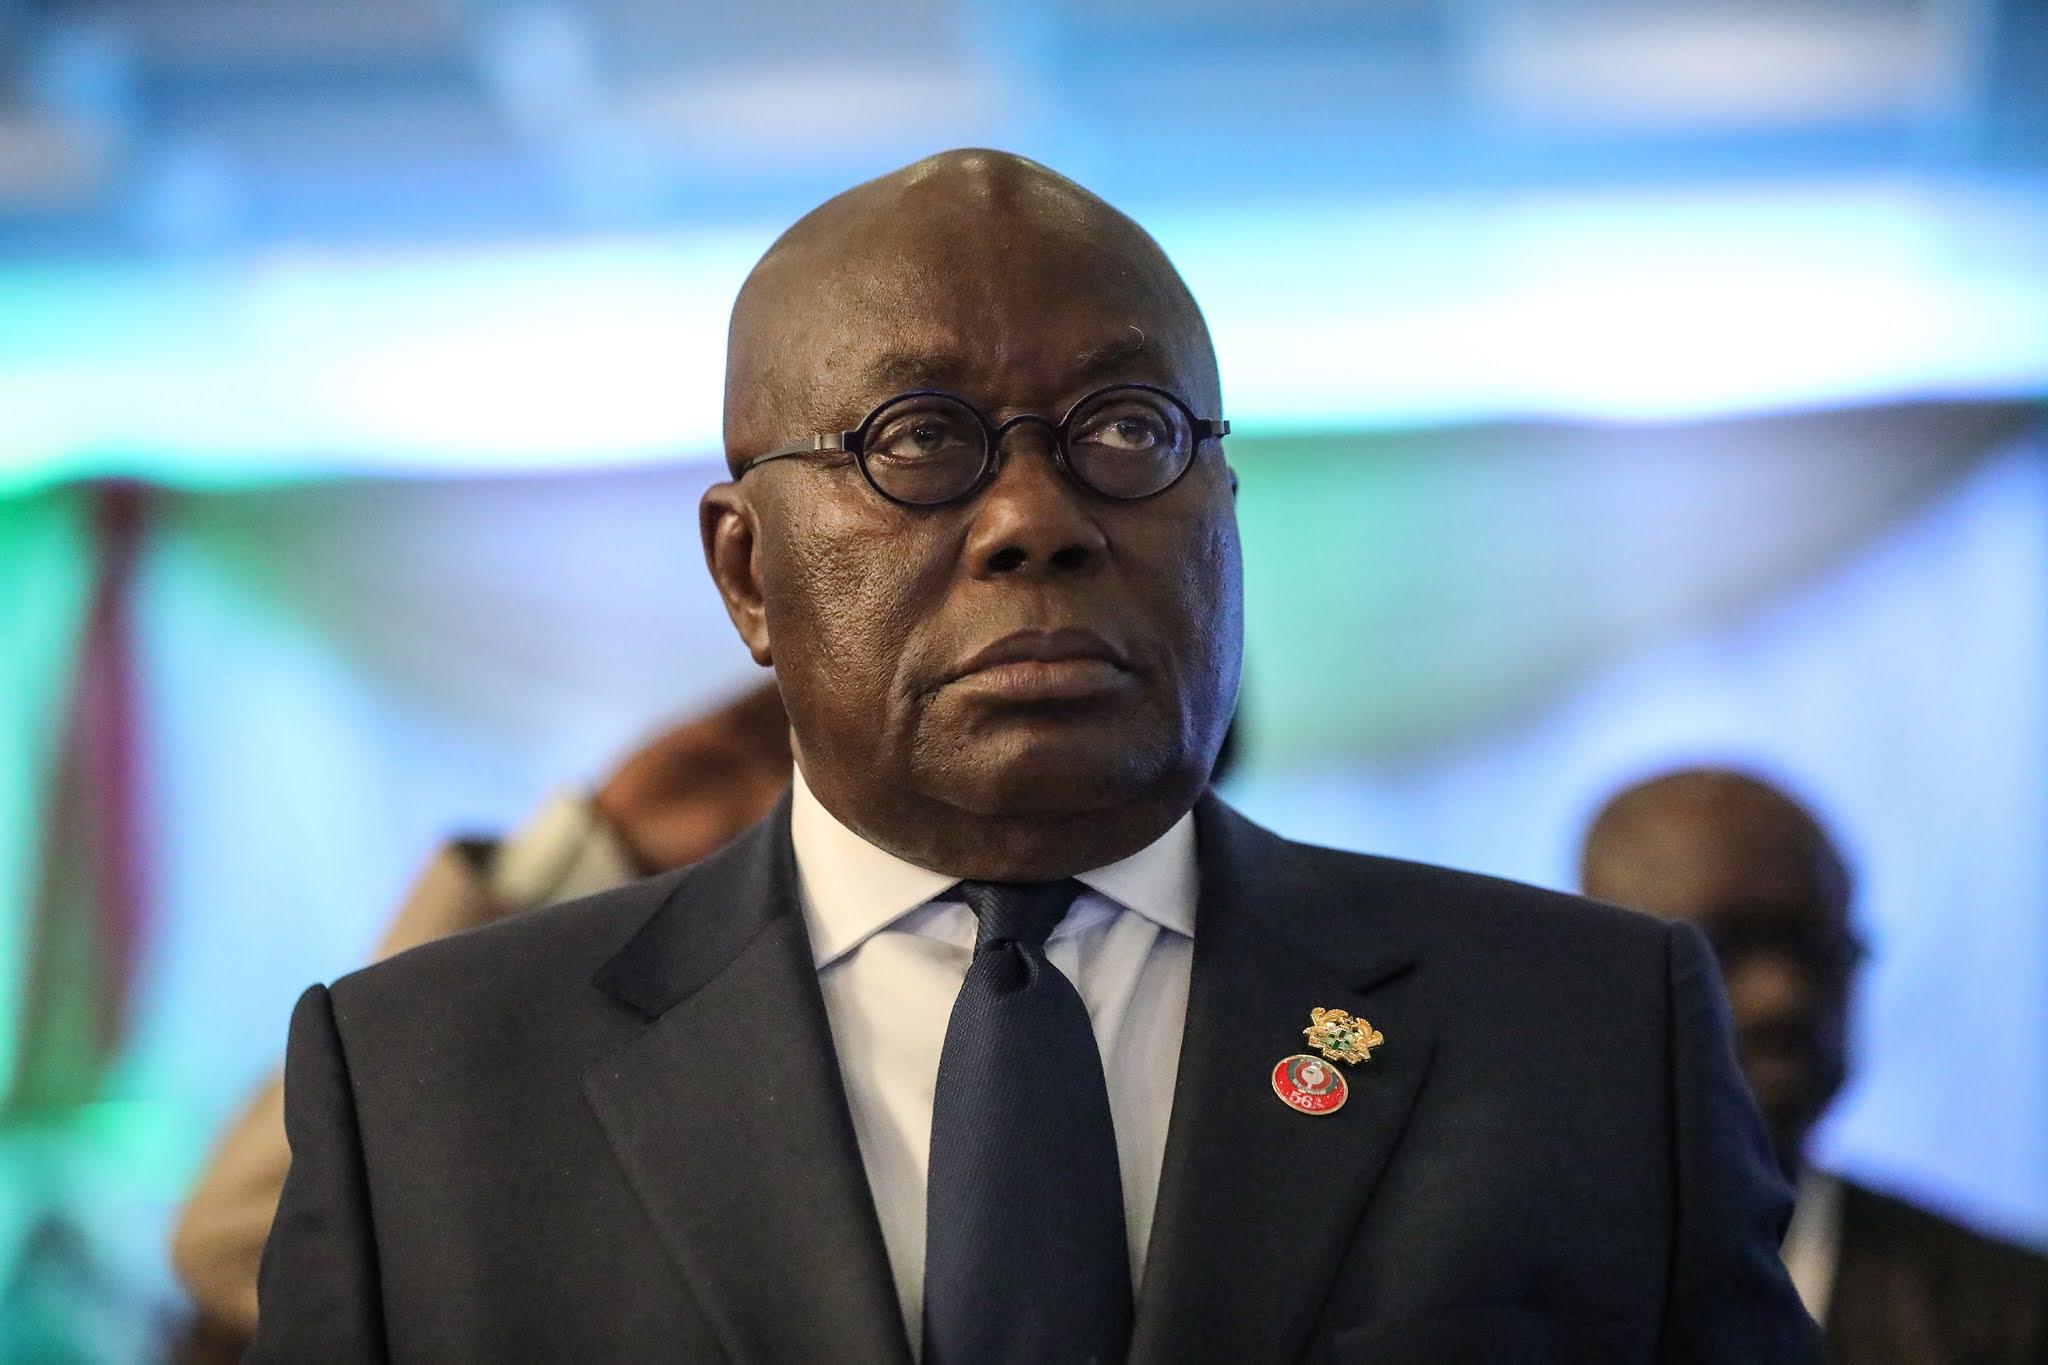 Ghana Elections 2020: Nana Akufo-Addo Declared Winner!